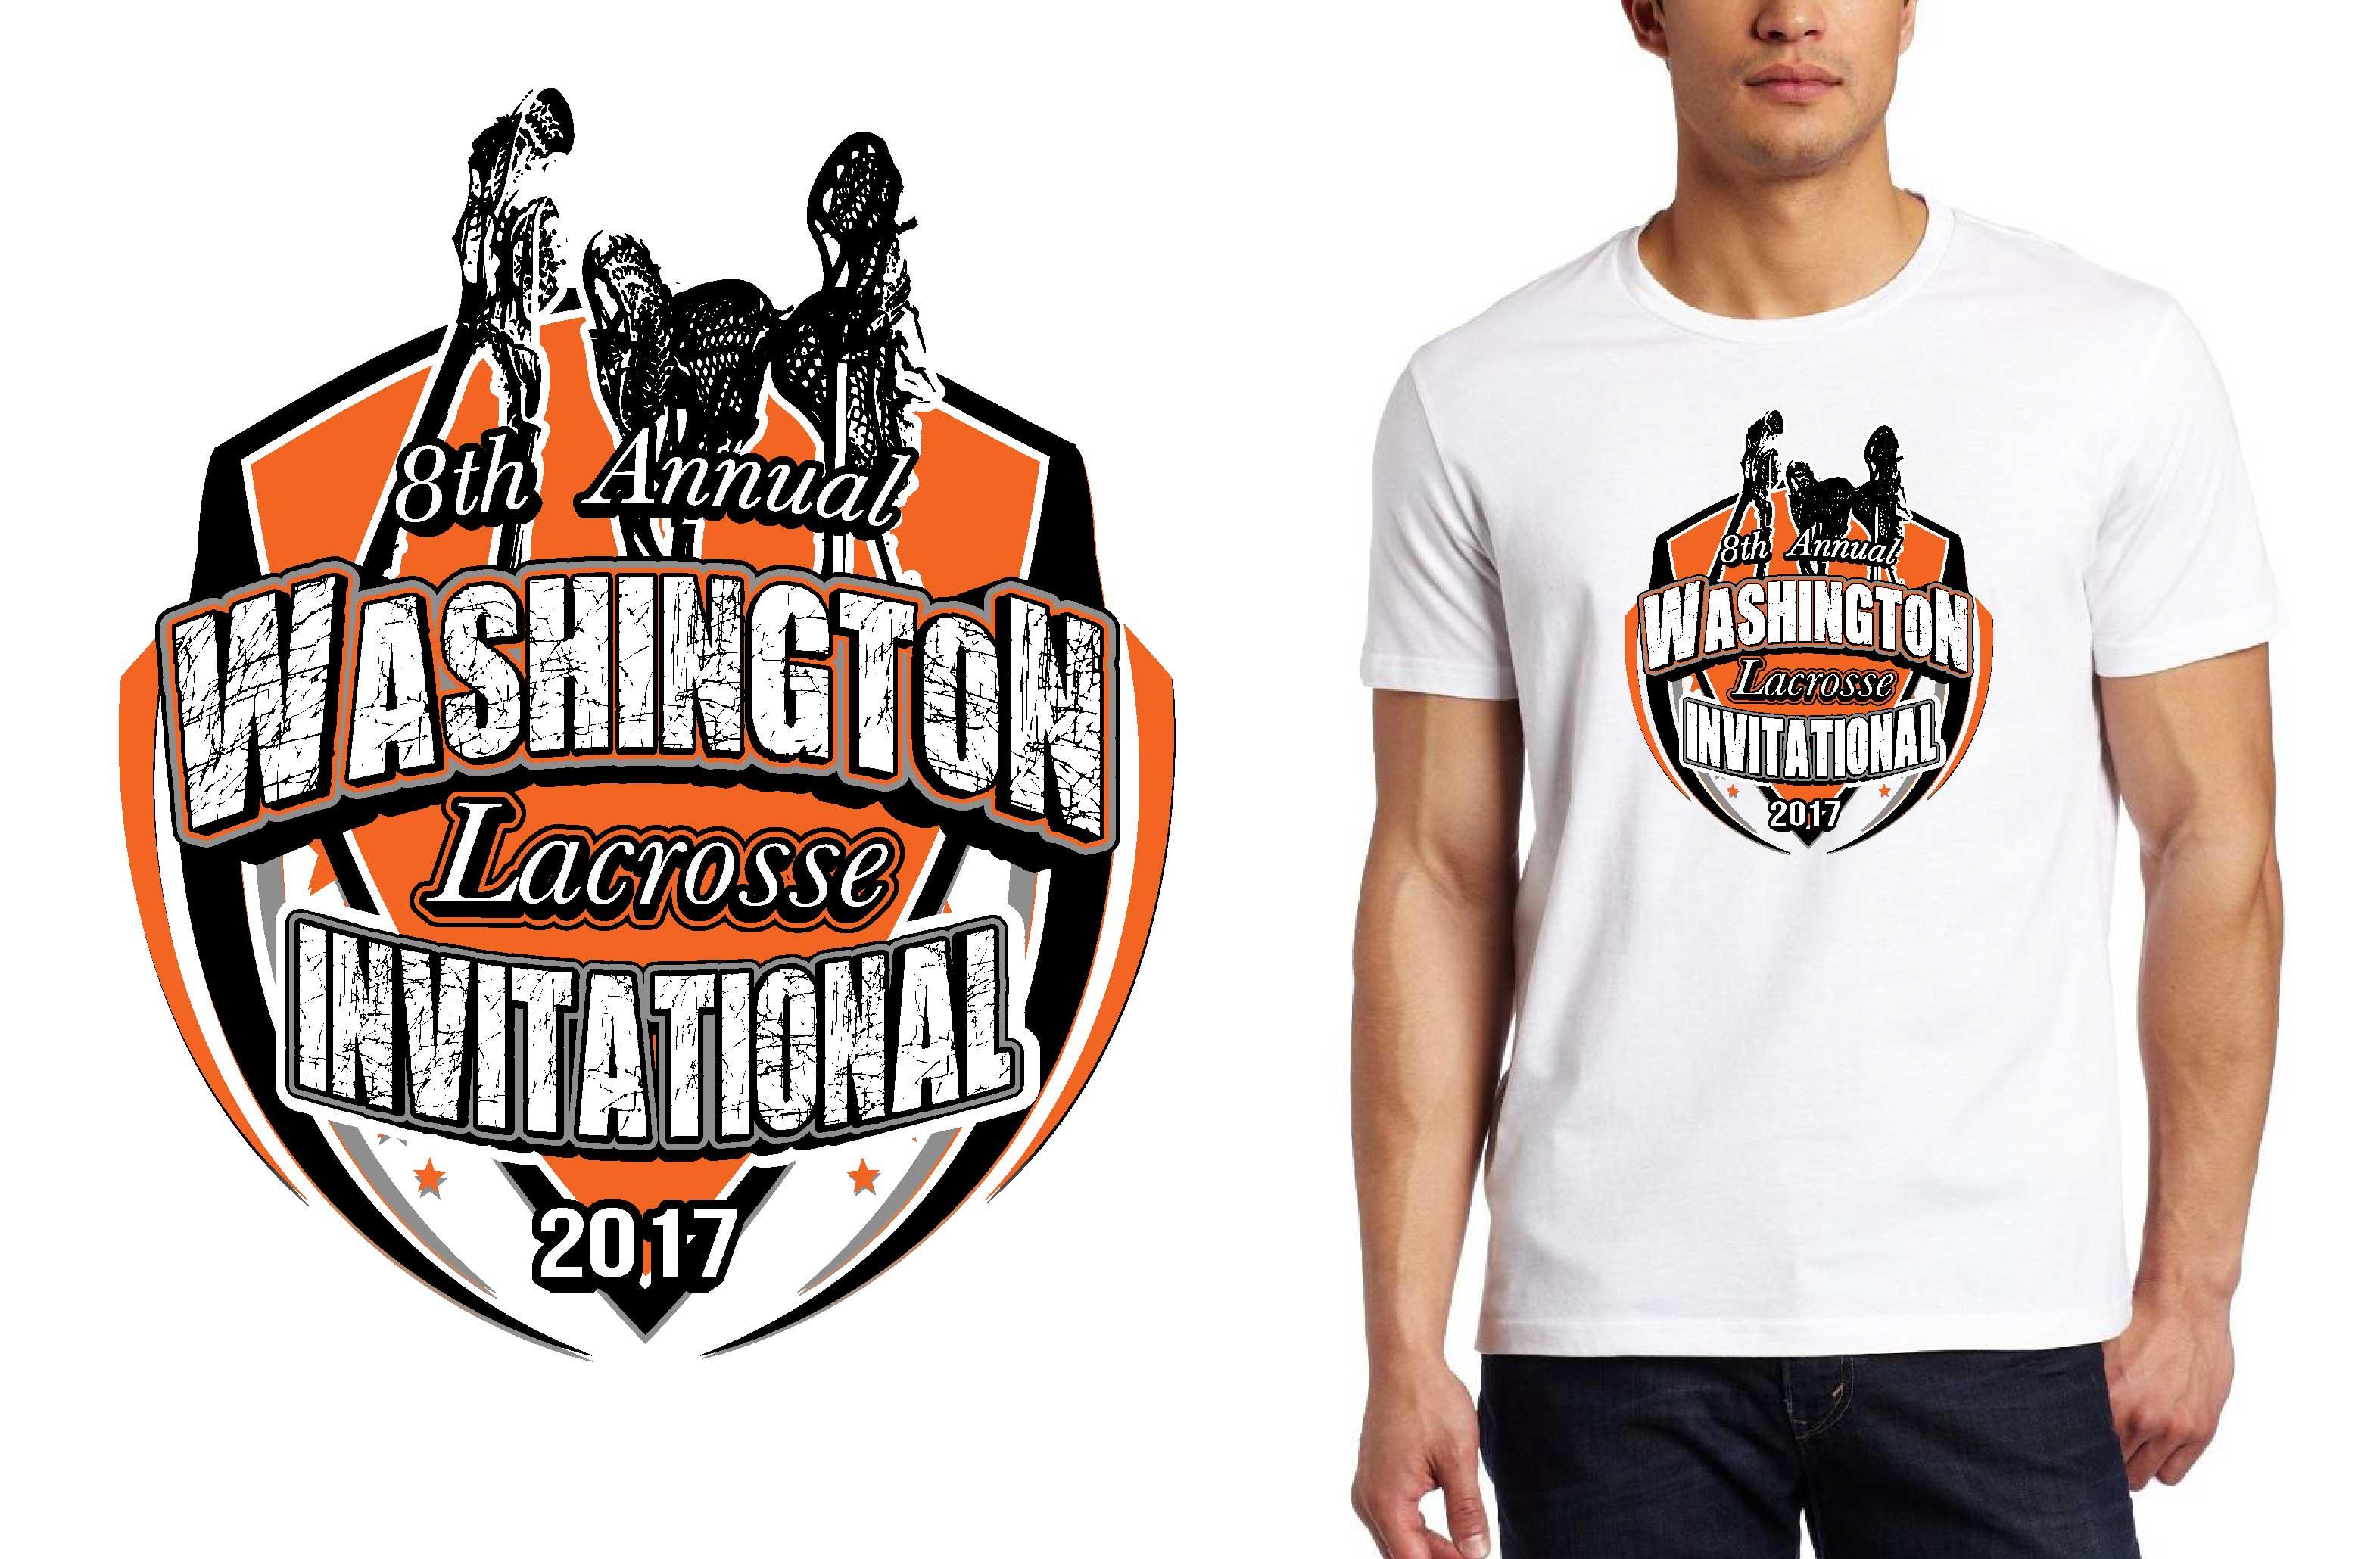 5.20.17 8th Annual Washington Lacrosse Invitational lori lacrosse